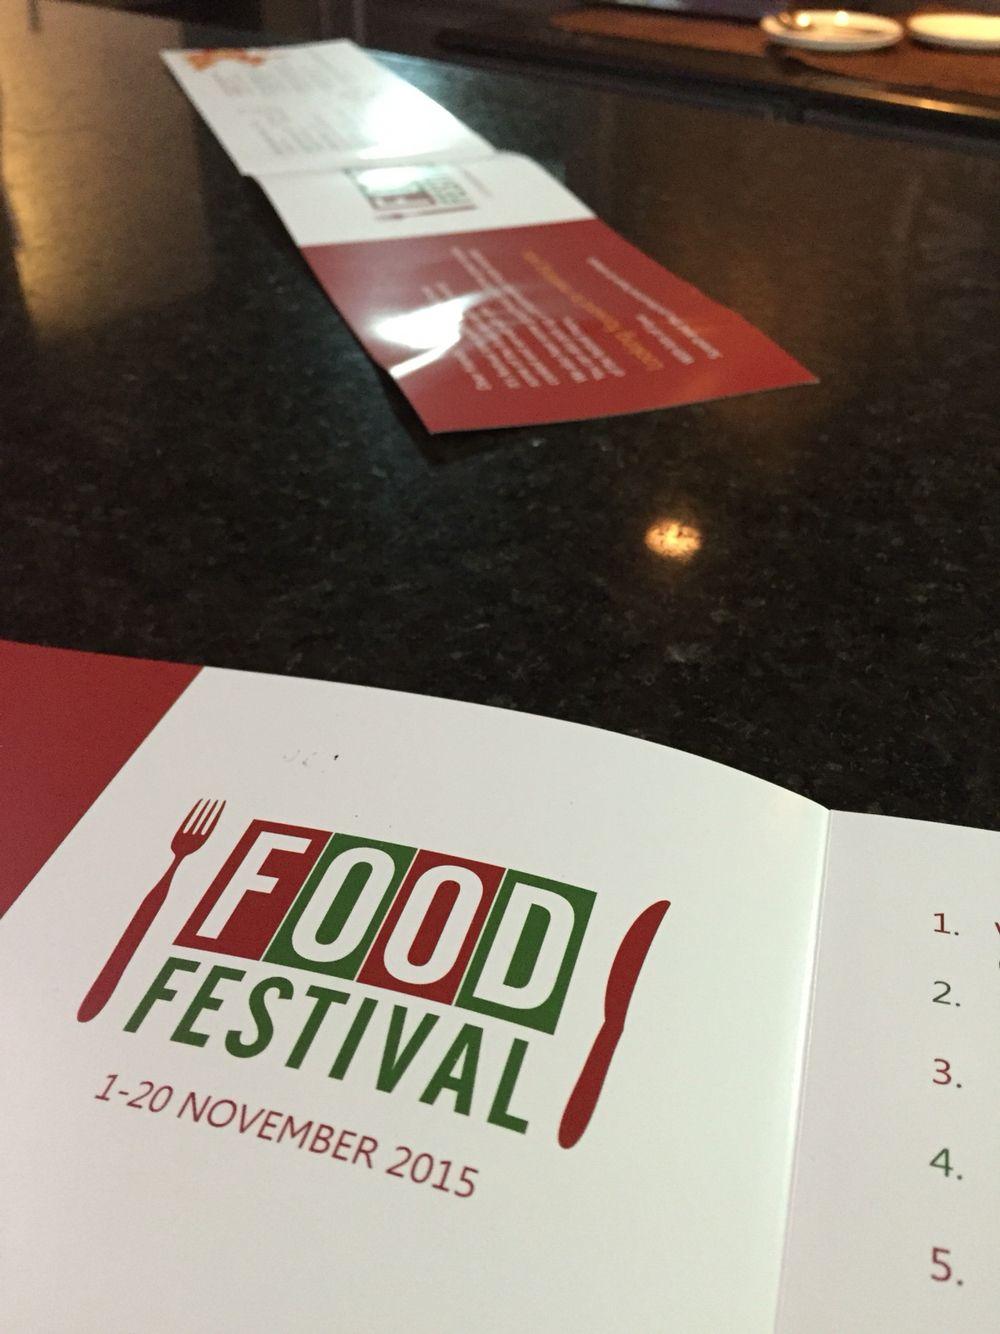 Annual food festival food festival cards against